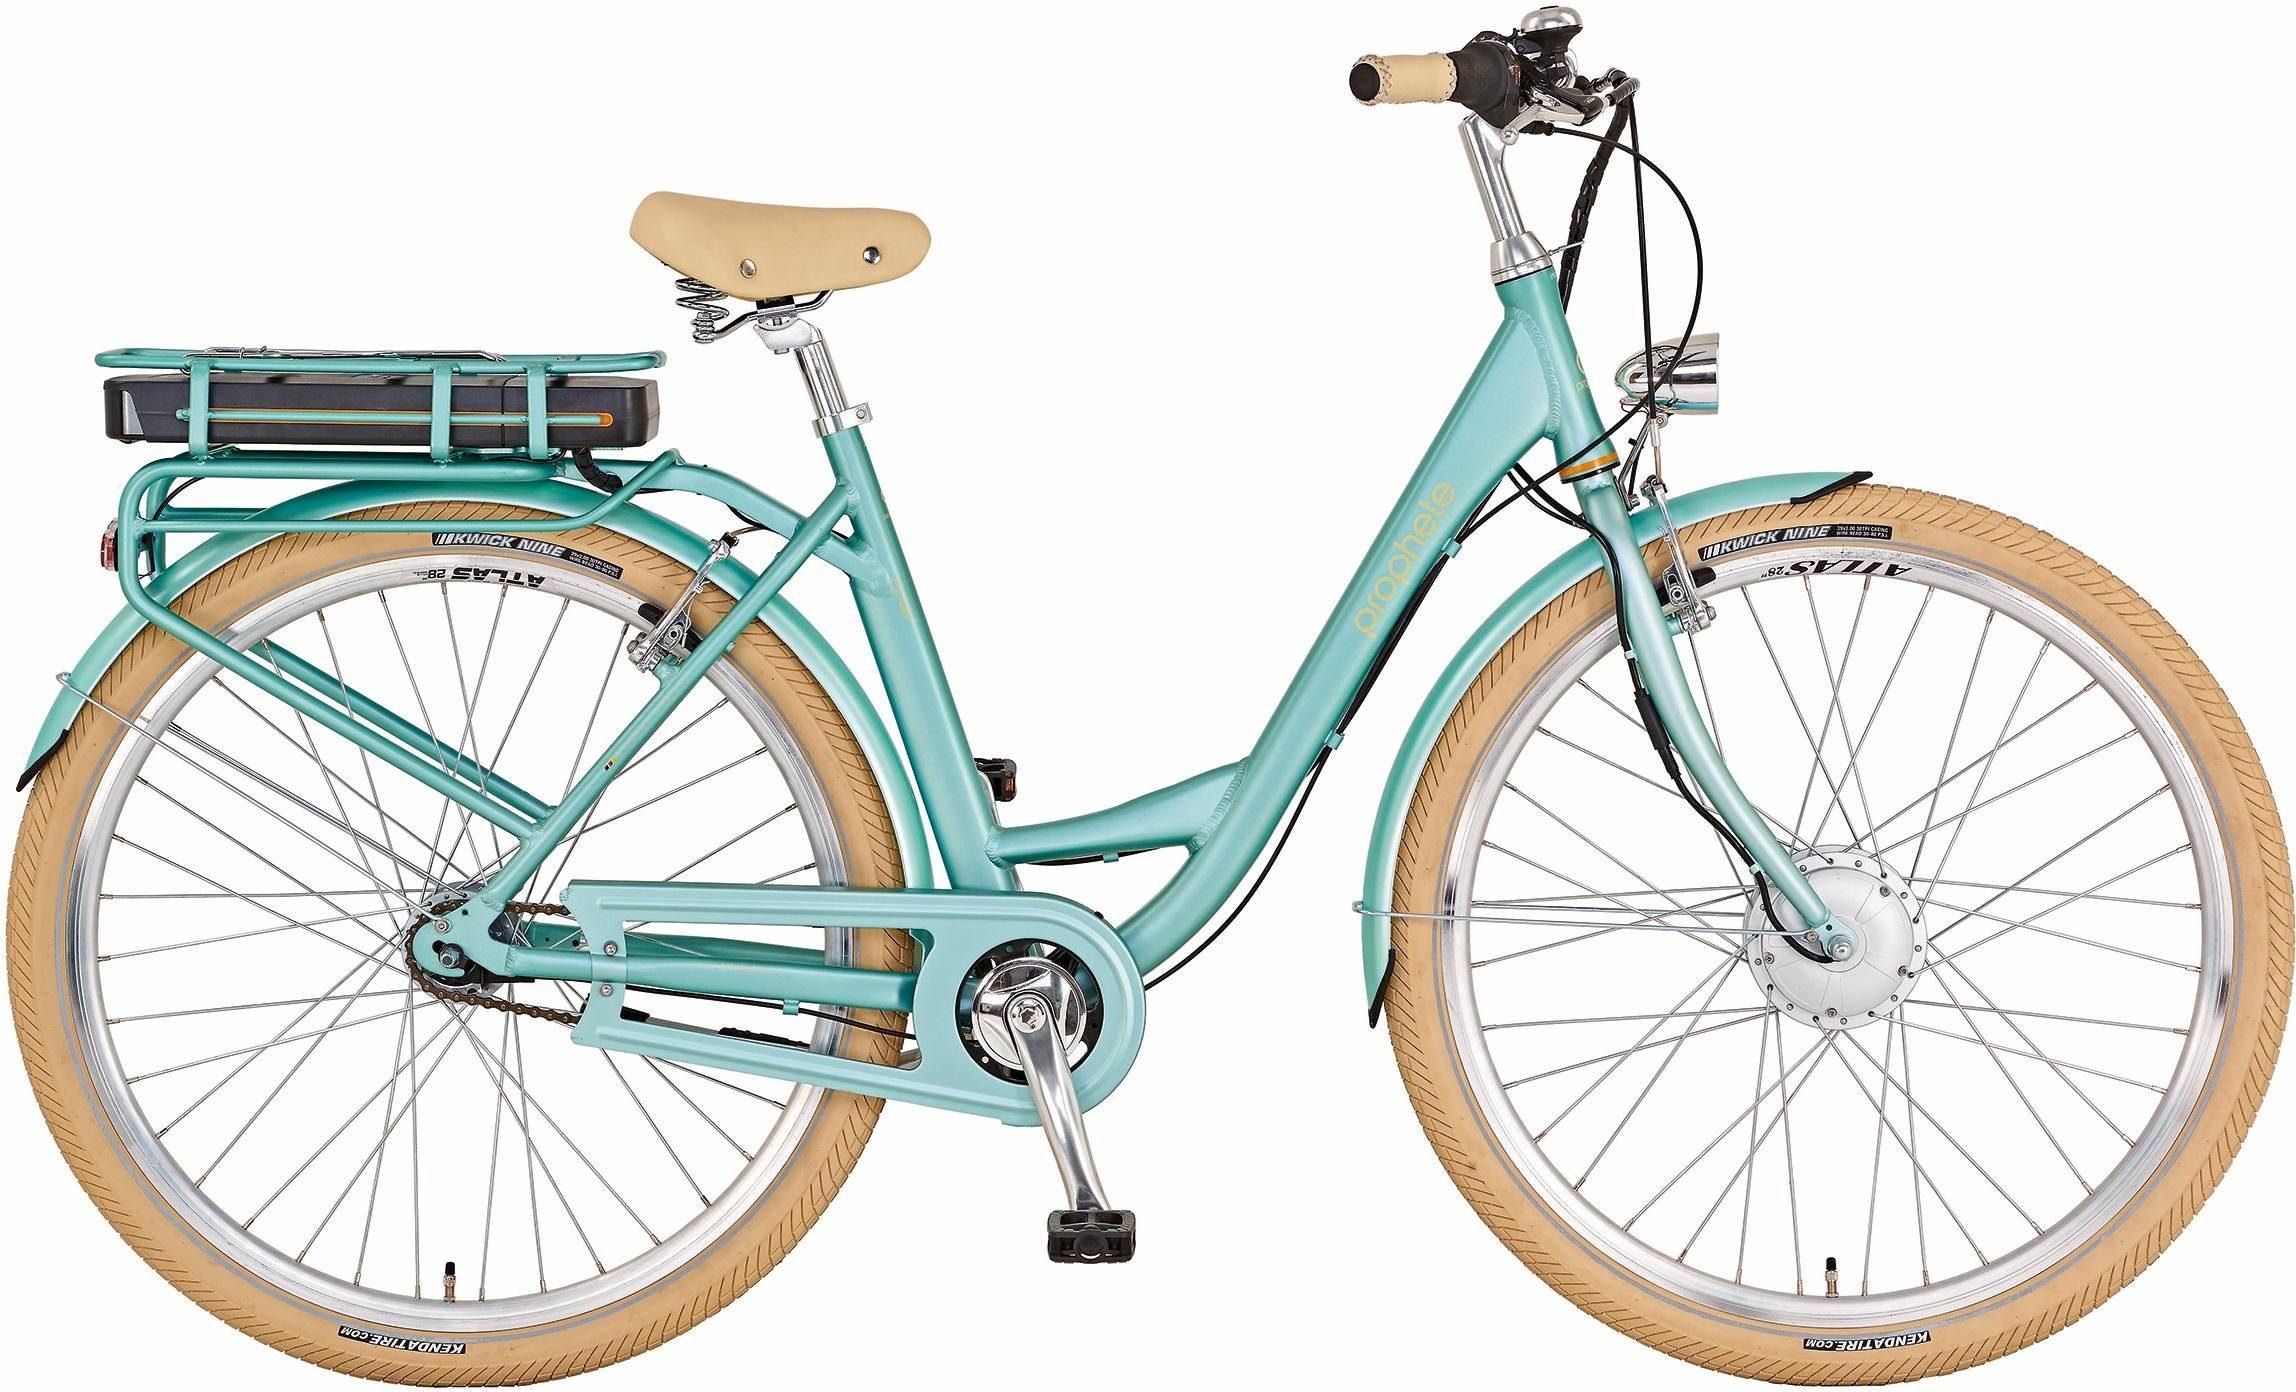 Prophete Damen City E-Bike, Vorderradmotor 36V/250W, 28 Zoll, 7 Gang Shimano Nexus, »Flair e«